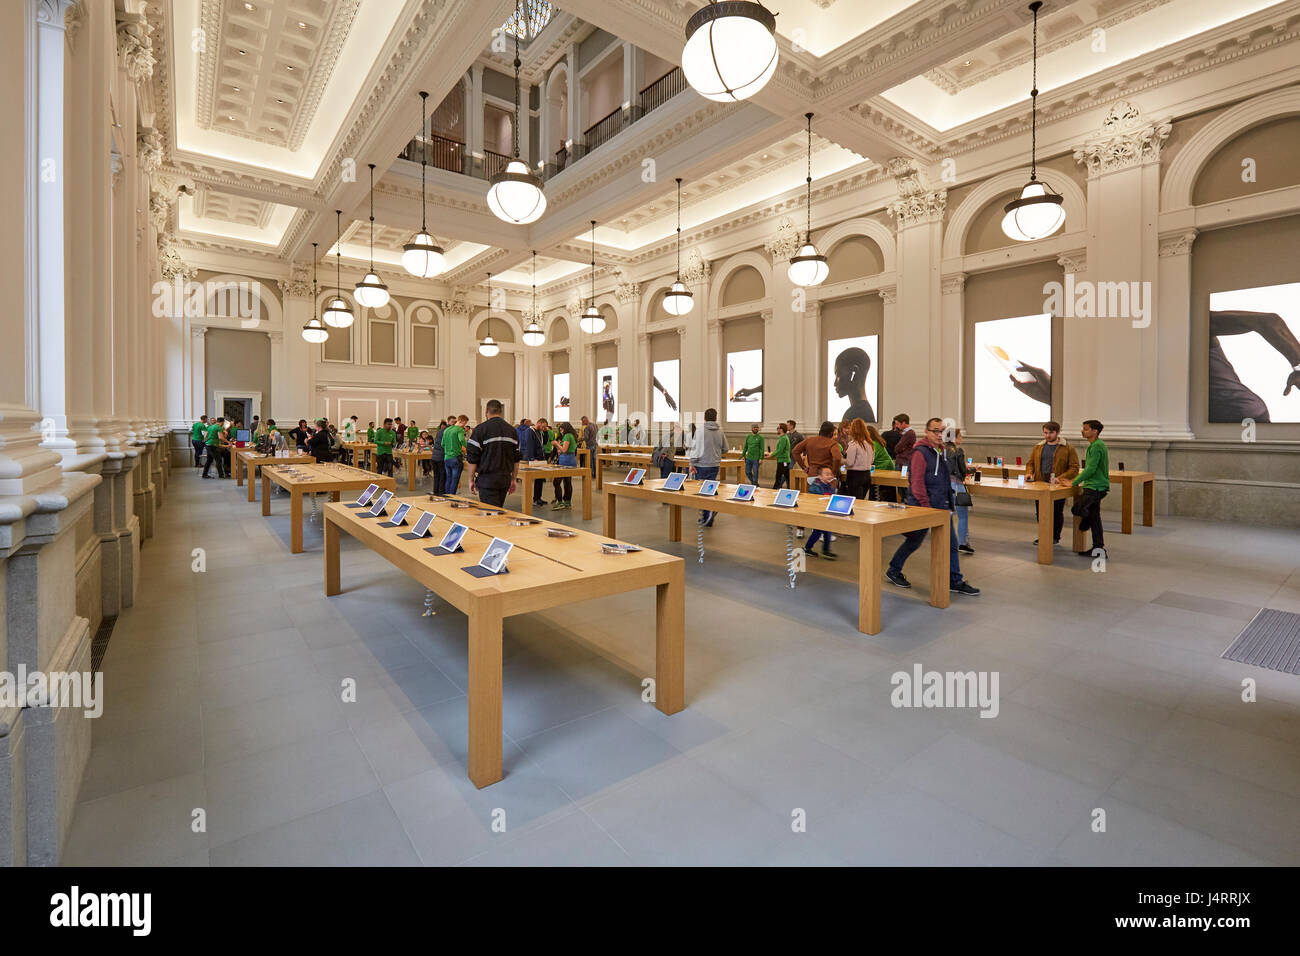 Interior of the Apple Store Birmingham West Midlands England